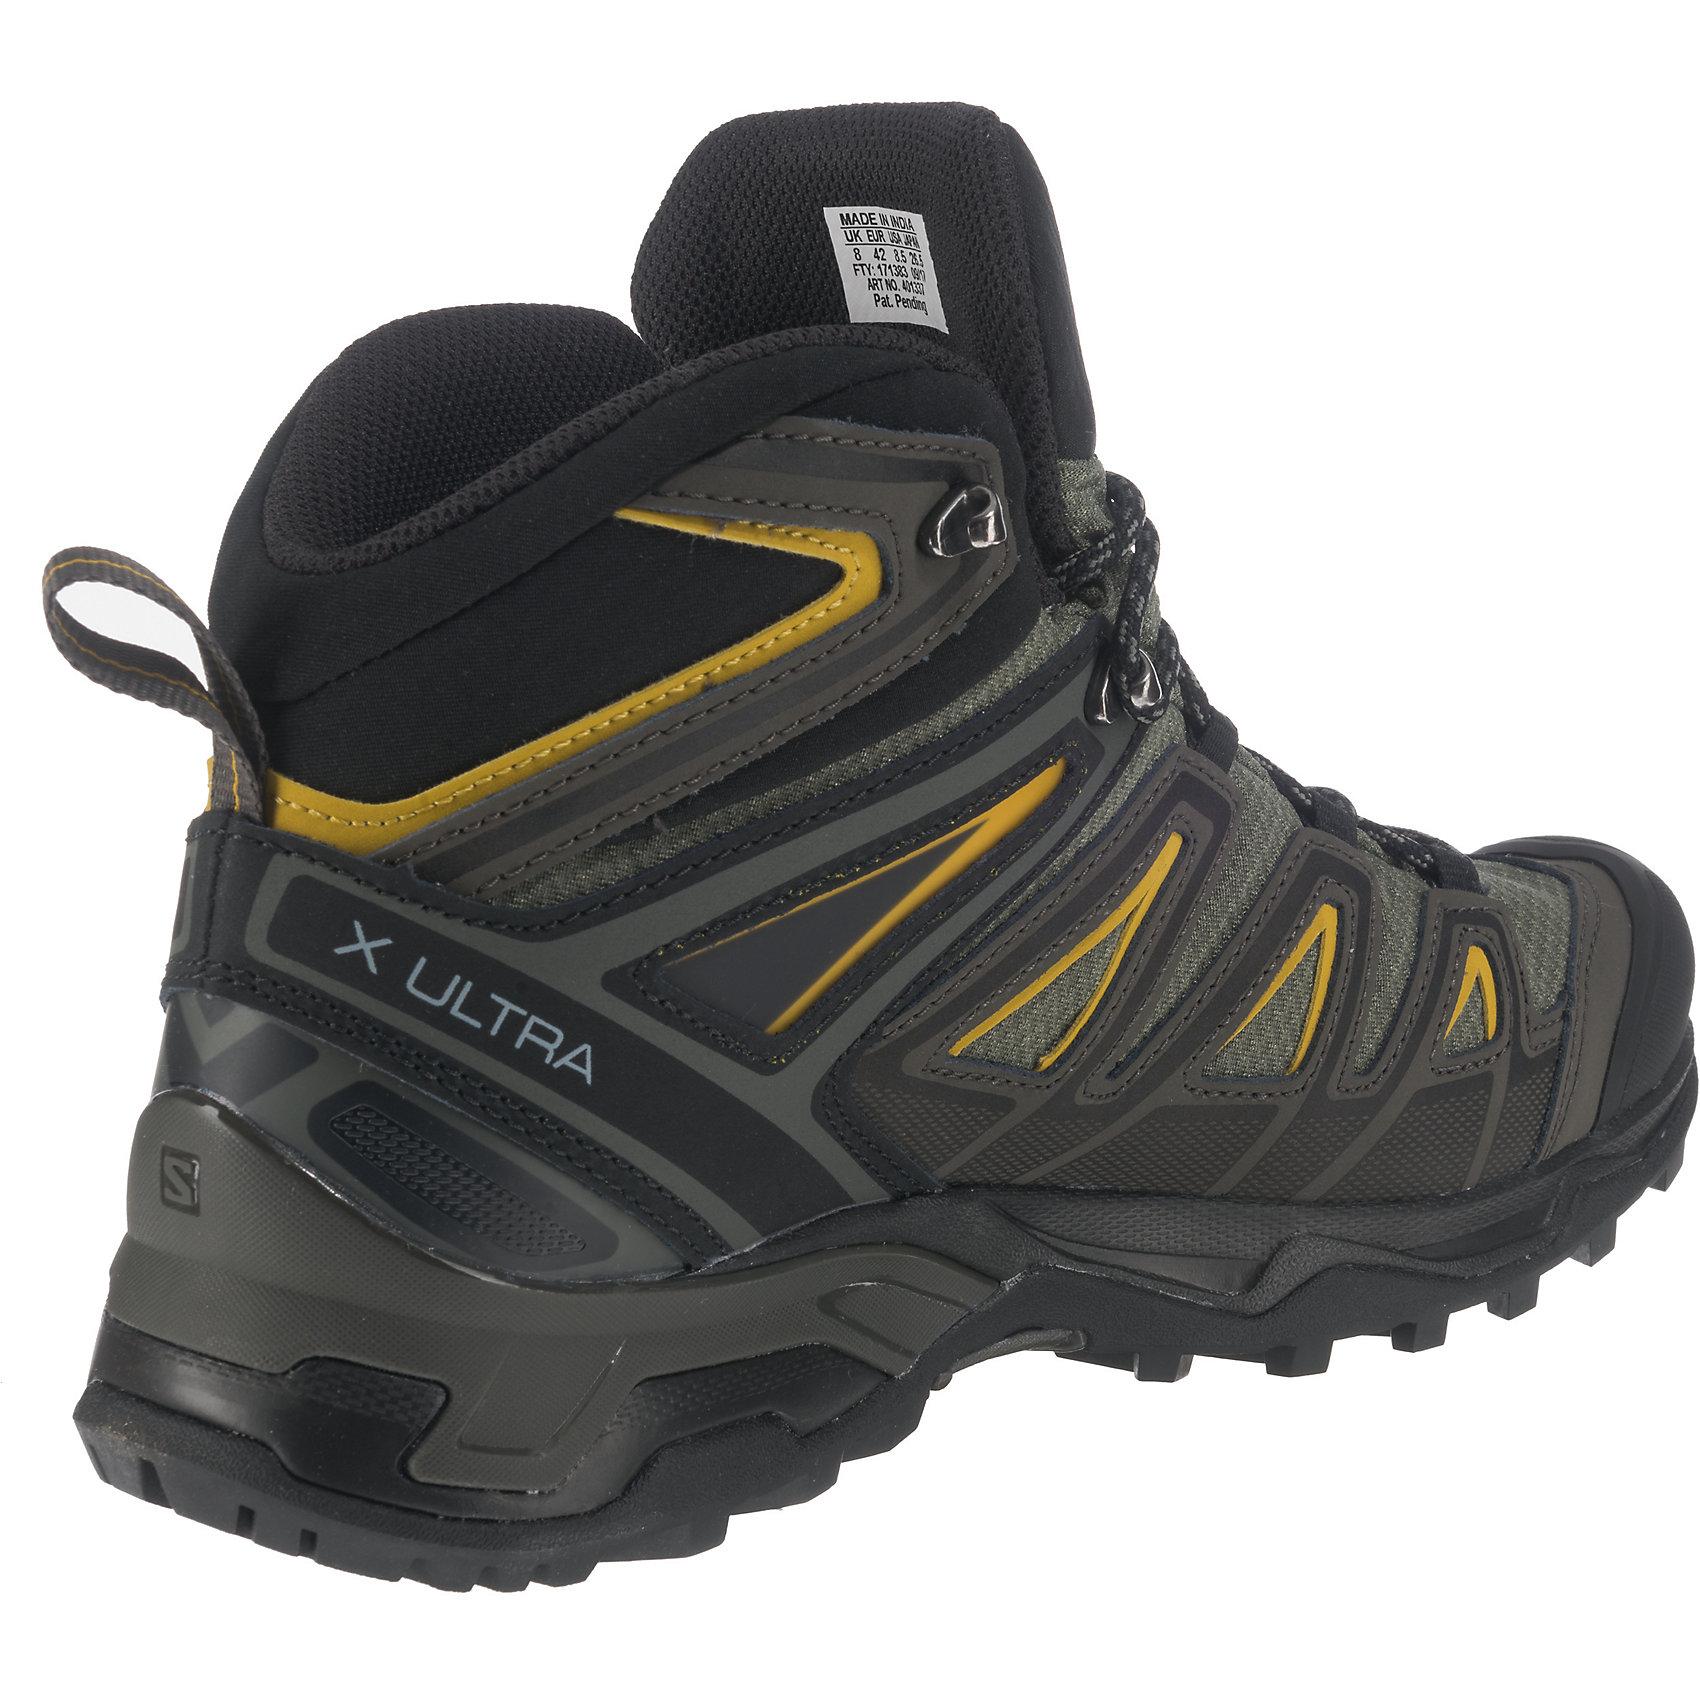 Neu Salomon X Ultra 3 3 3 MID GTX® Castor  Trekkingstiefel 6831815 für Herren 18e403